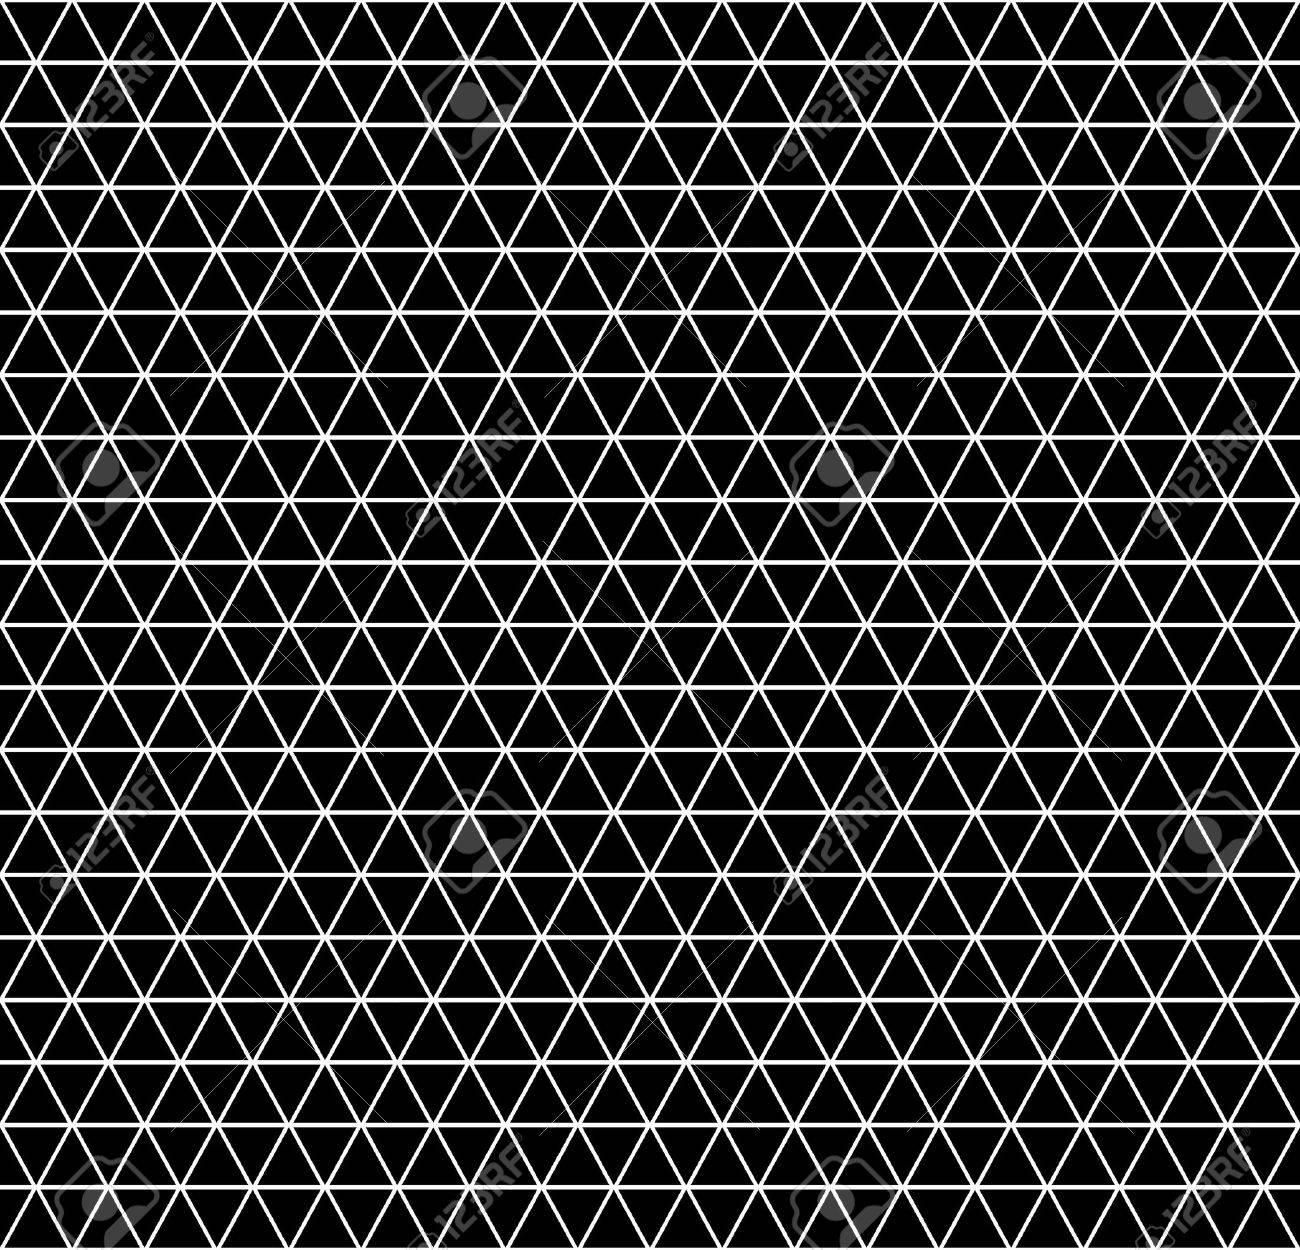 Seamless geometric latticed texture. Hexagons, diamonds and triangles pattern. Vector art. - 39241151